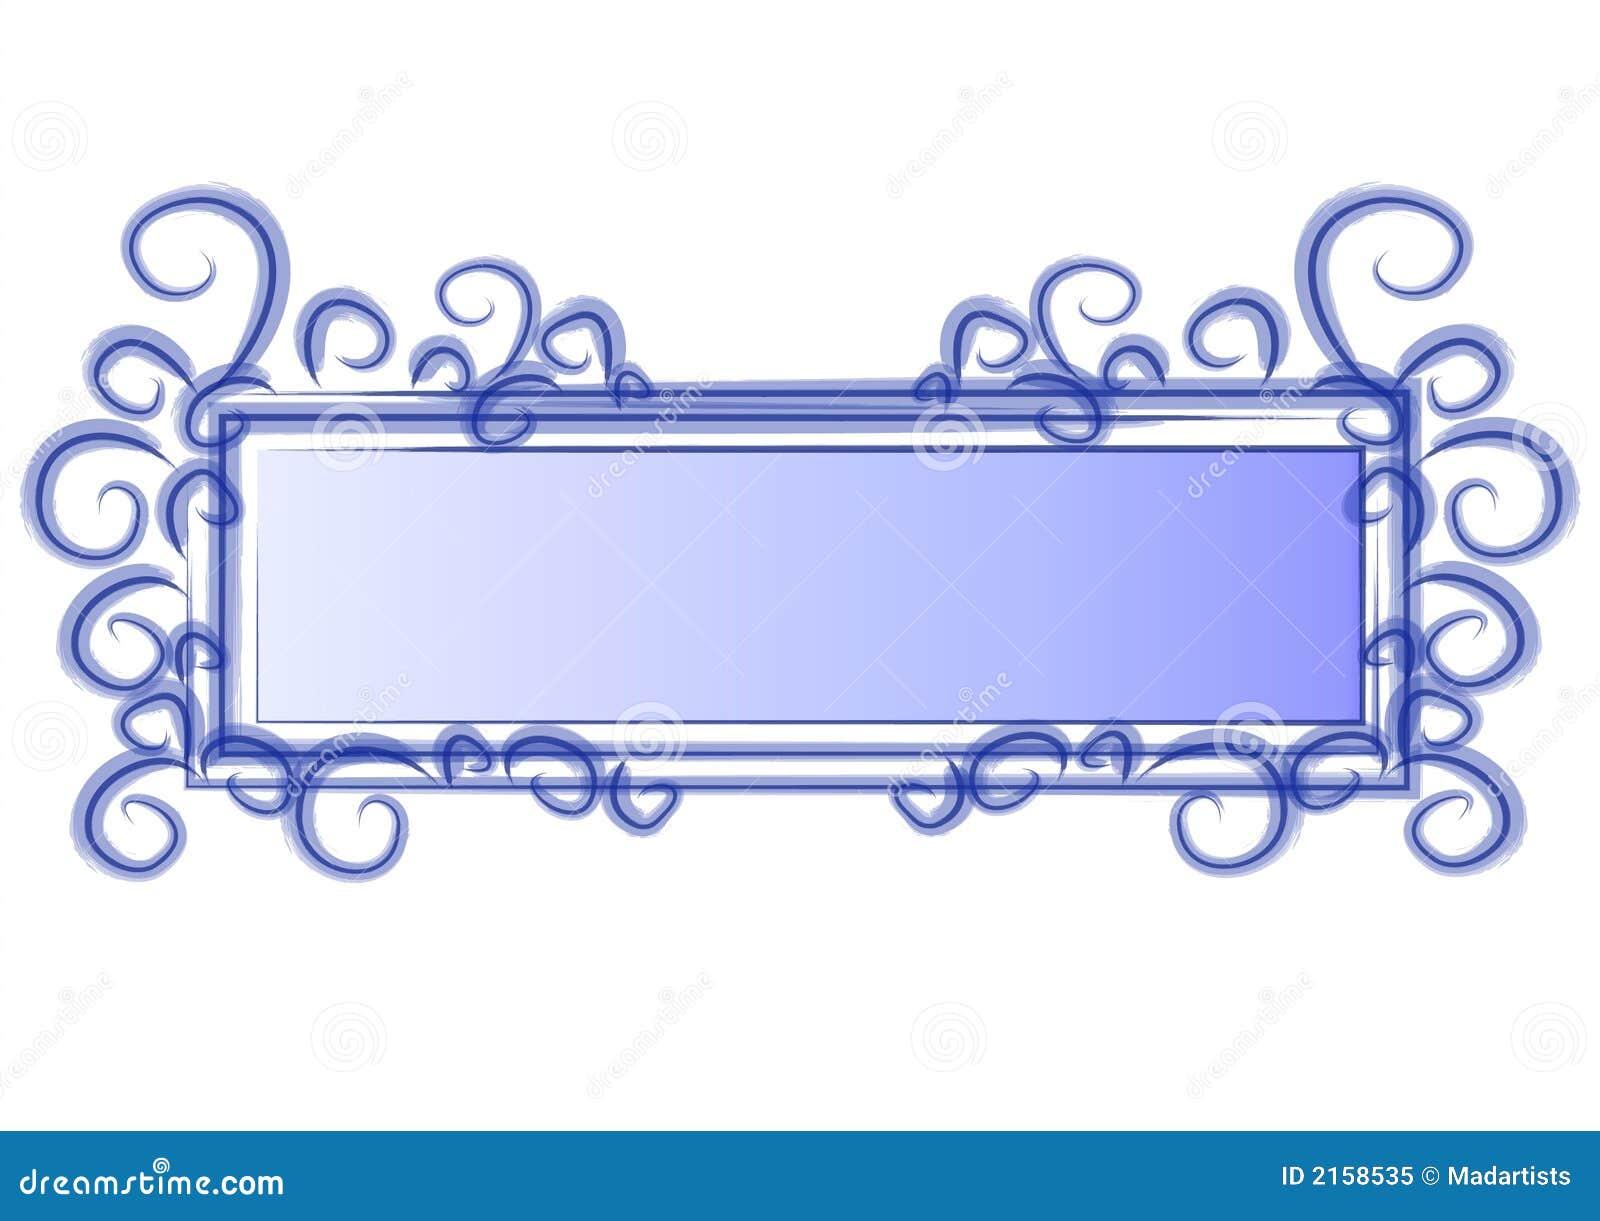 Web Page Logo Blue Swirls Royalty Free Stock Photo - Image: 2158535